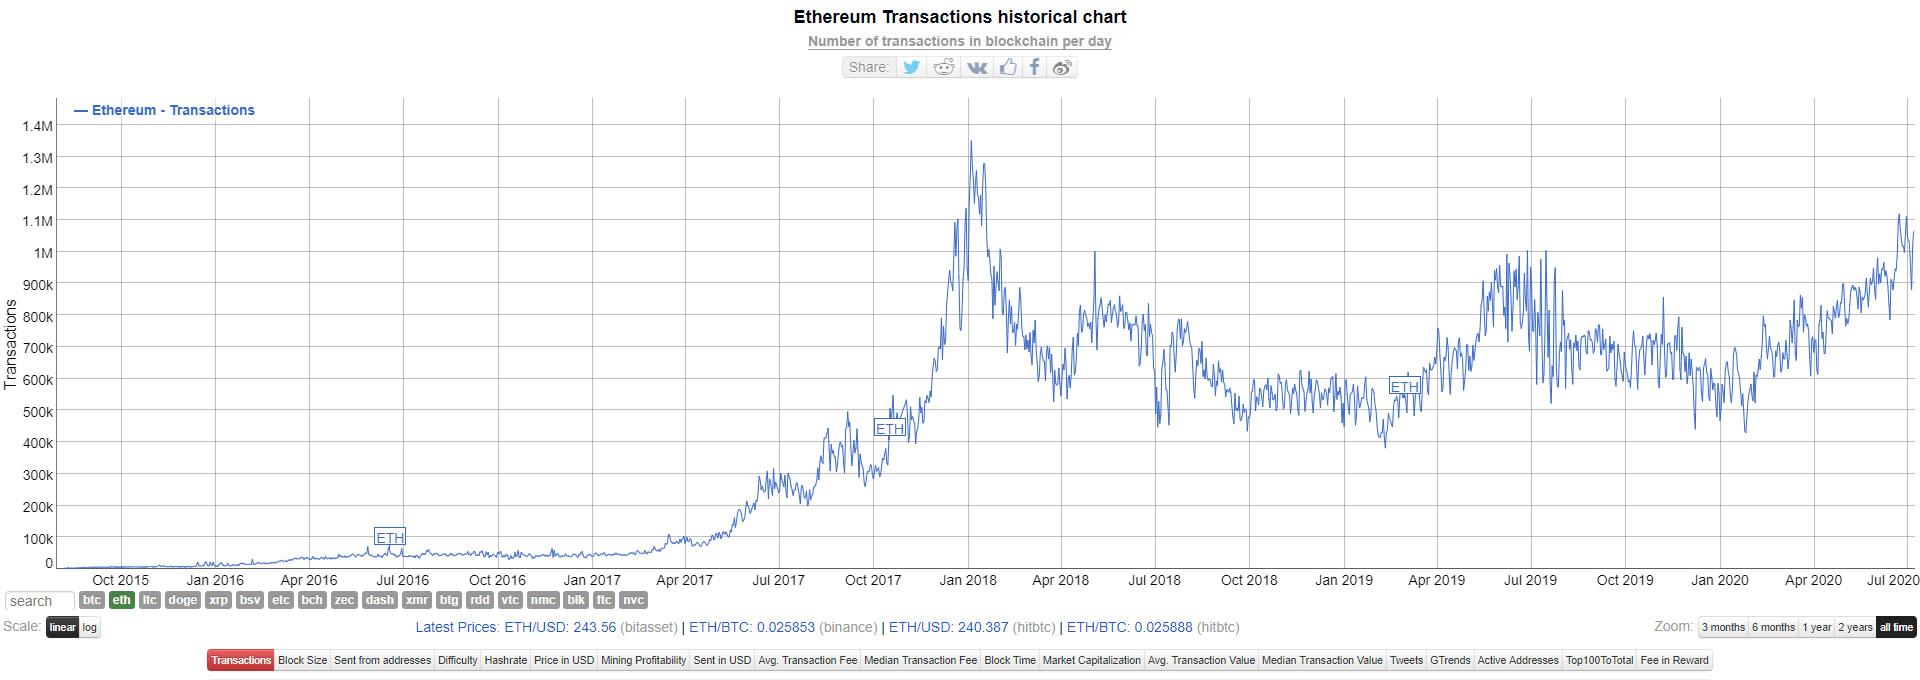 Ethereum transactions